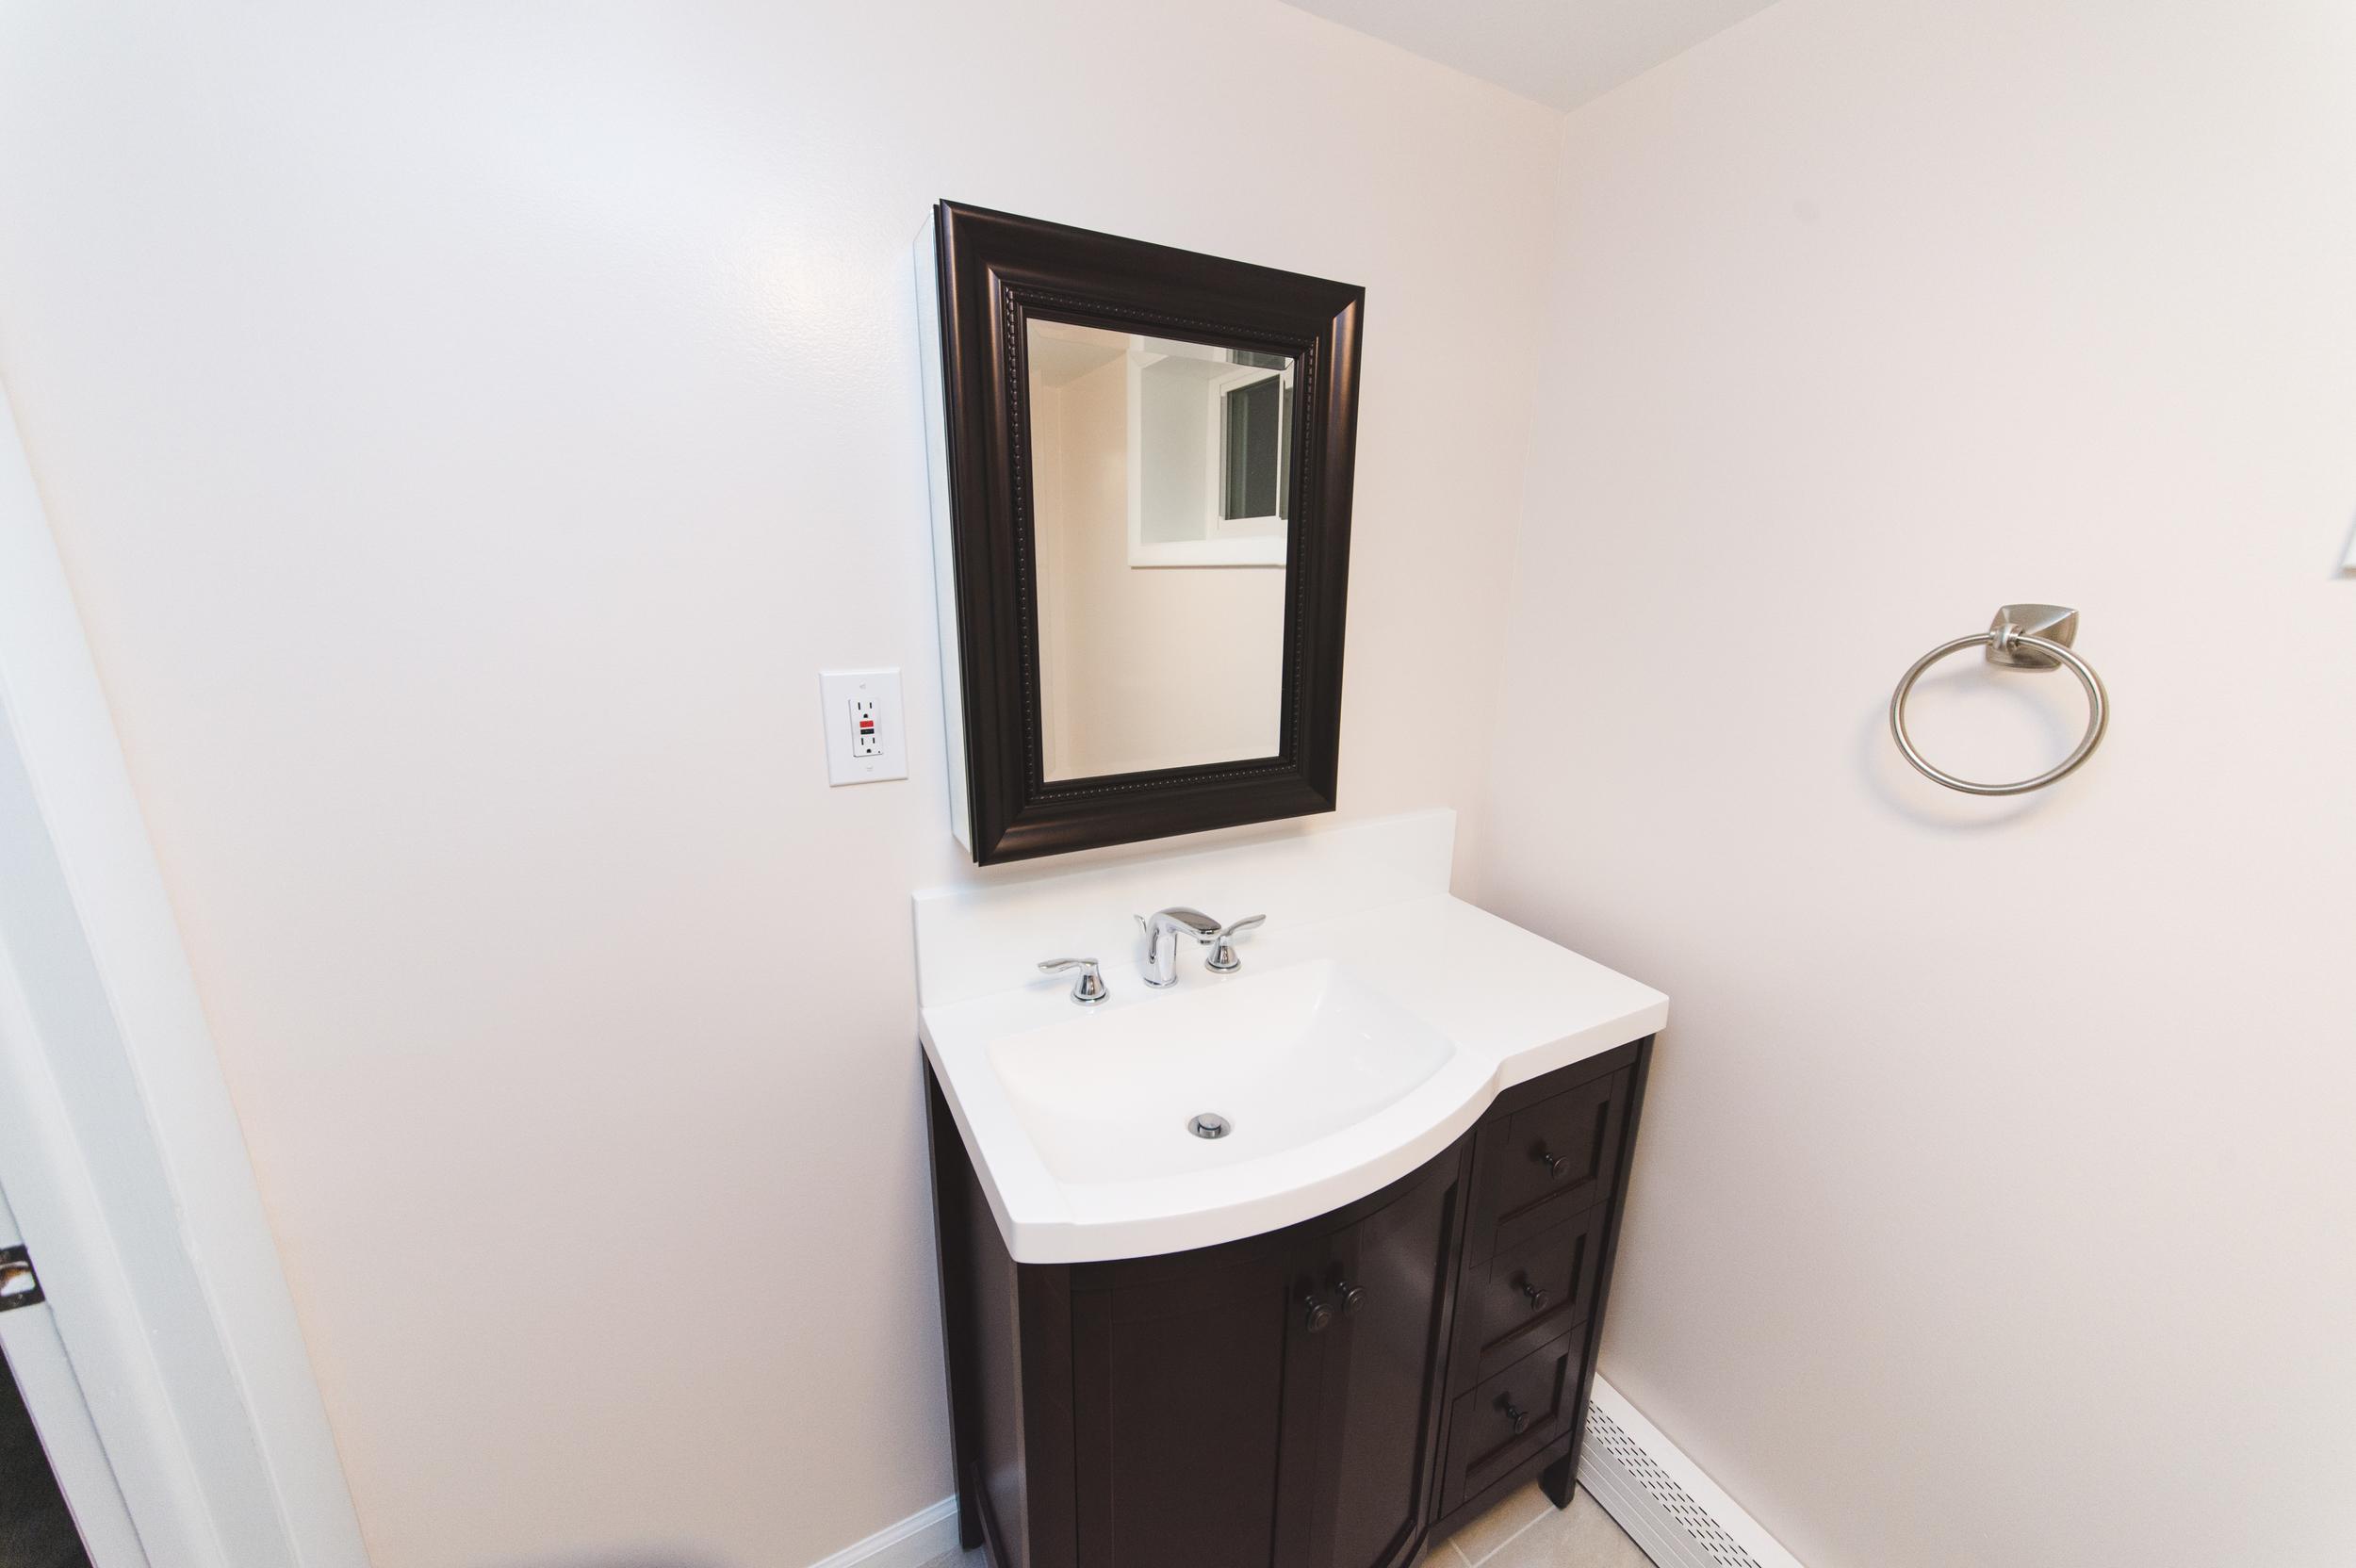 Zhiru Bathroom Remodeling Ellicott City MD-21.jpg